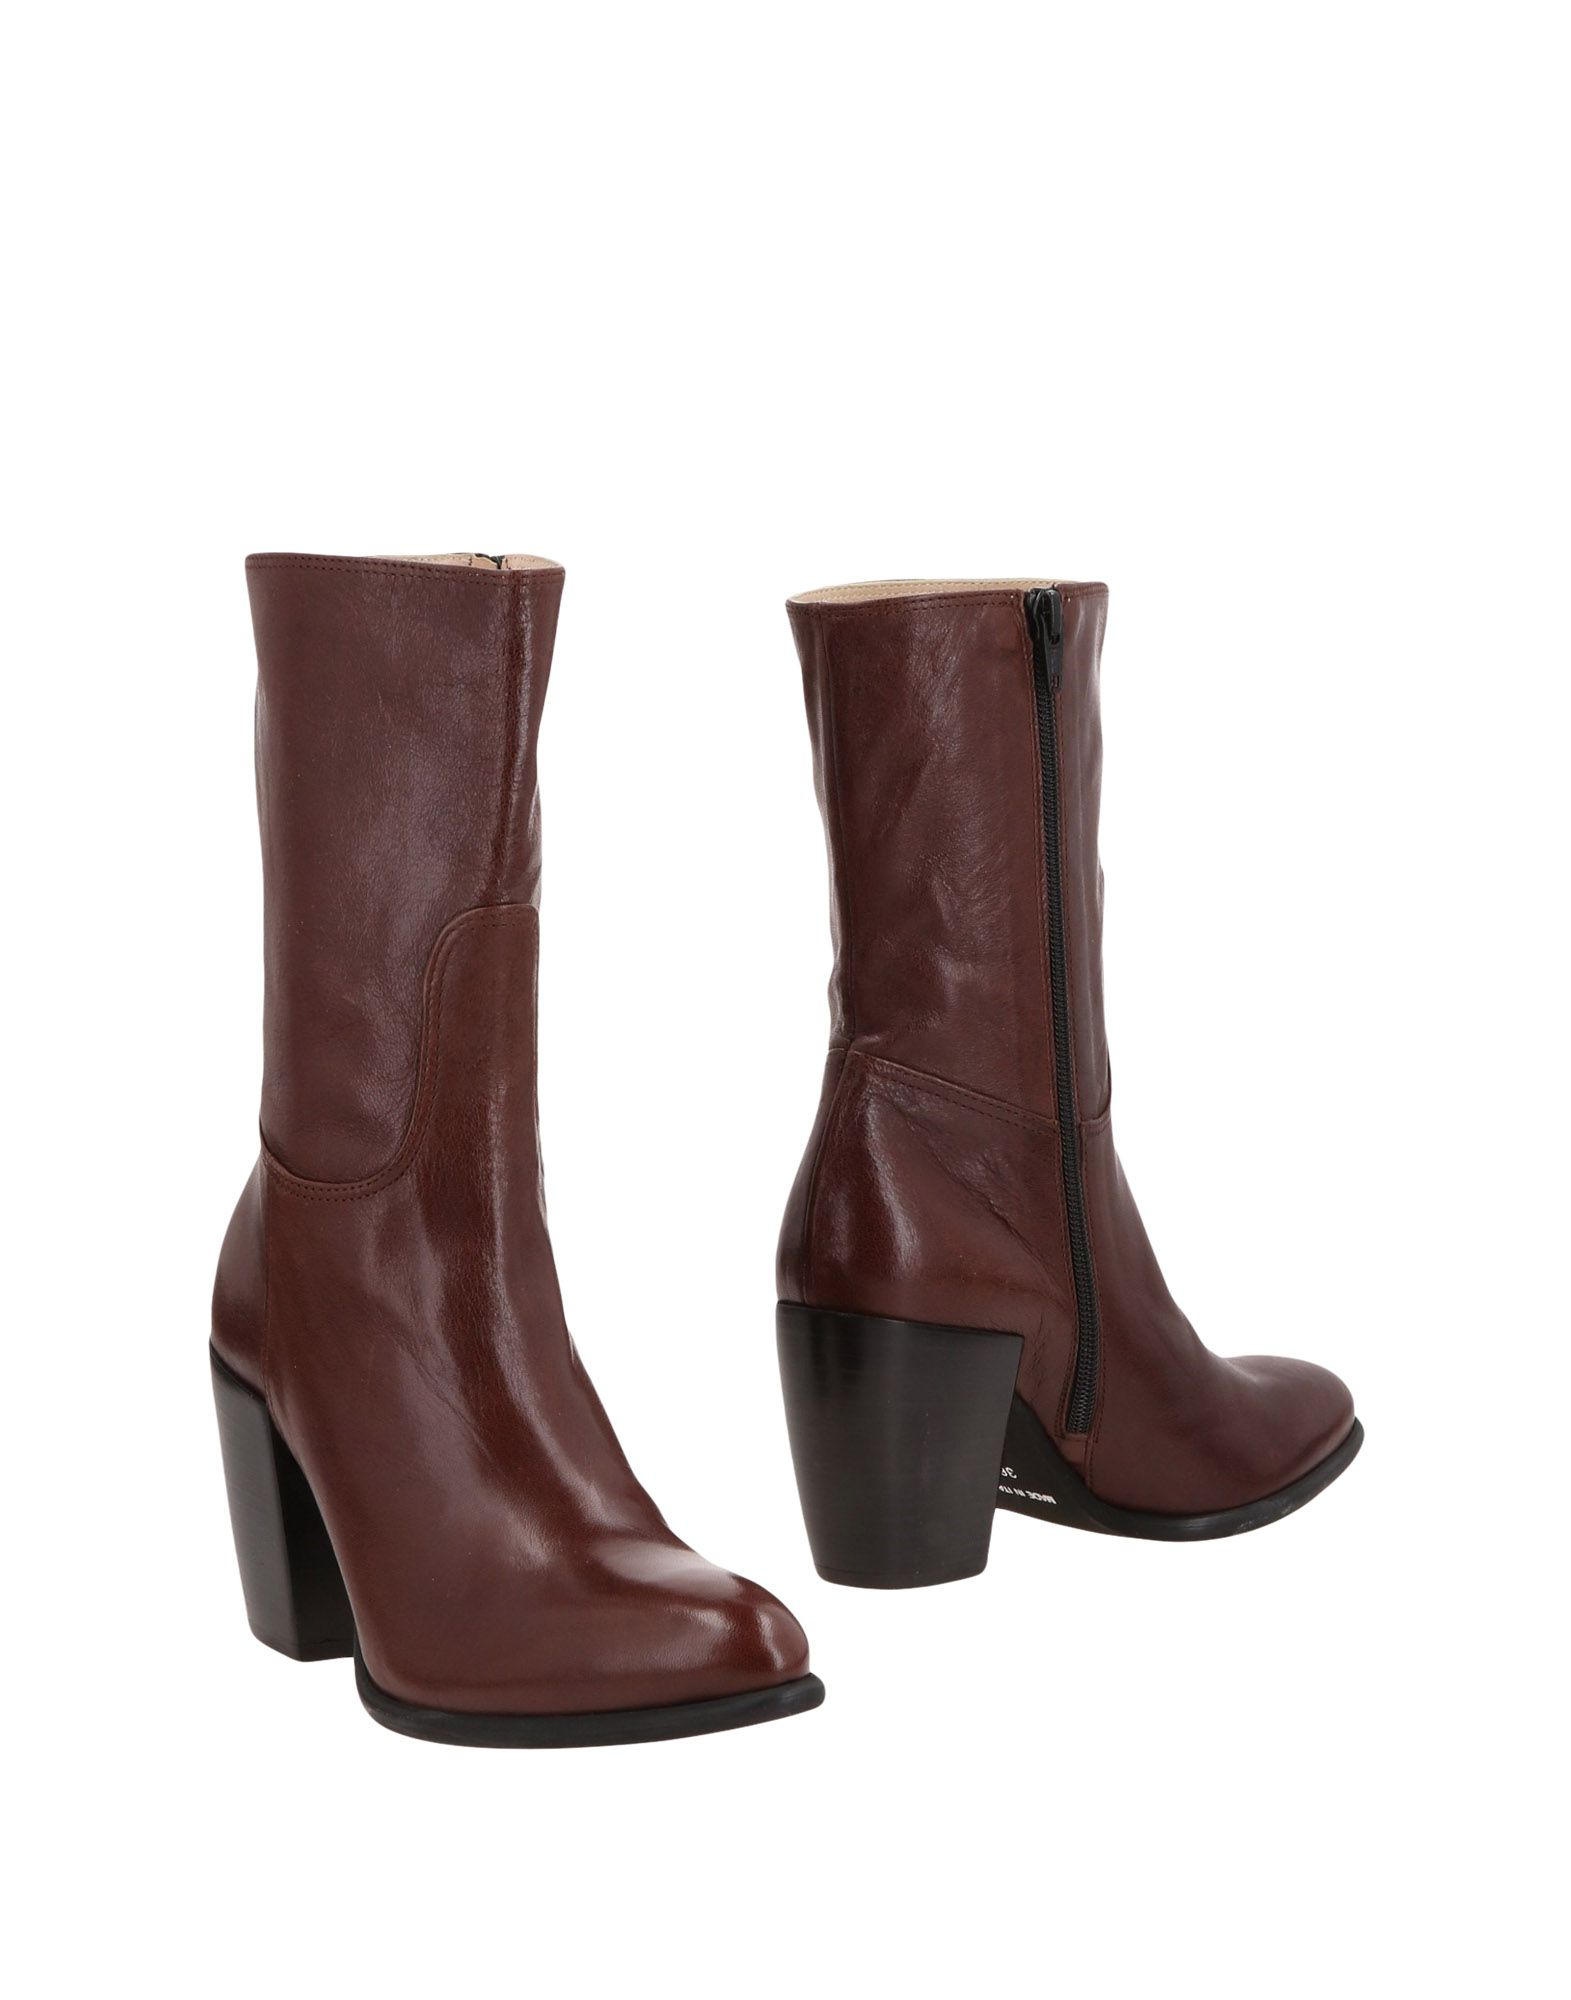 Chiarini Bologna Ankle Boot - Women Women Women Chiarini Bologna Ankle Boots online on  United Kingdom - 11337726VT 232233